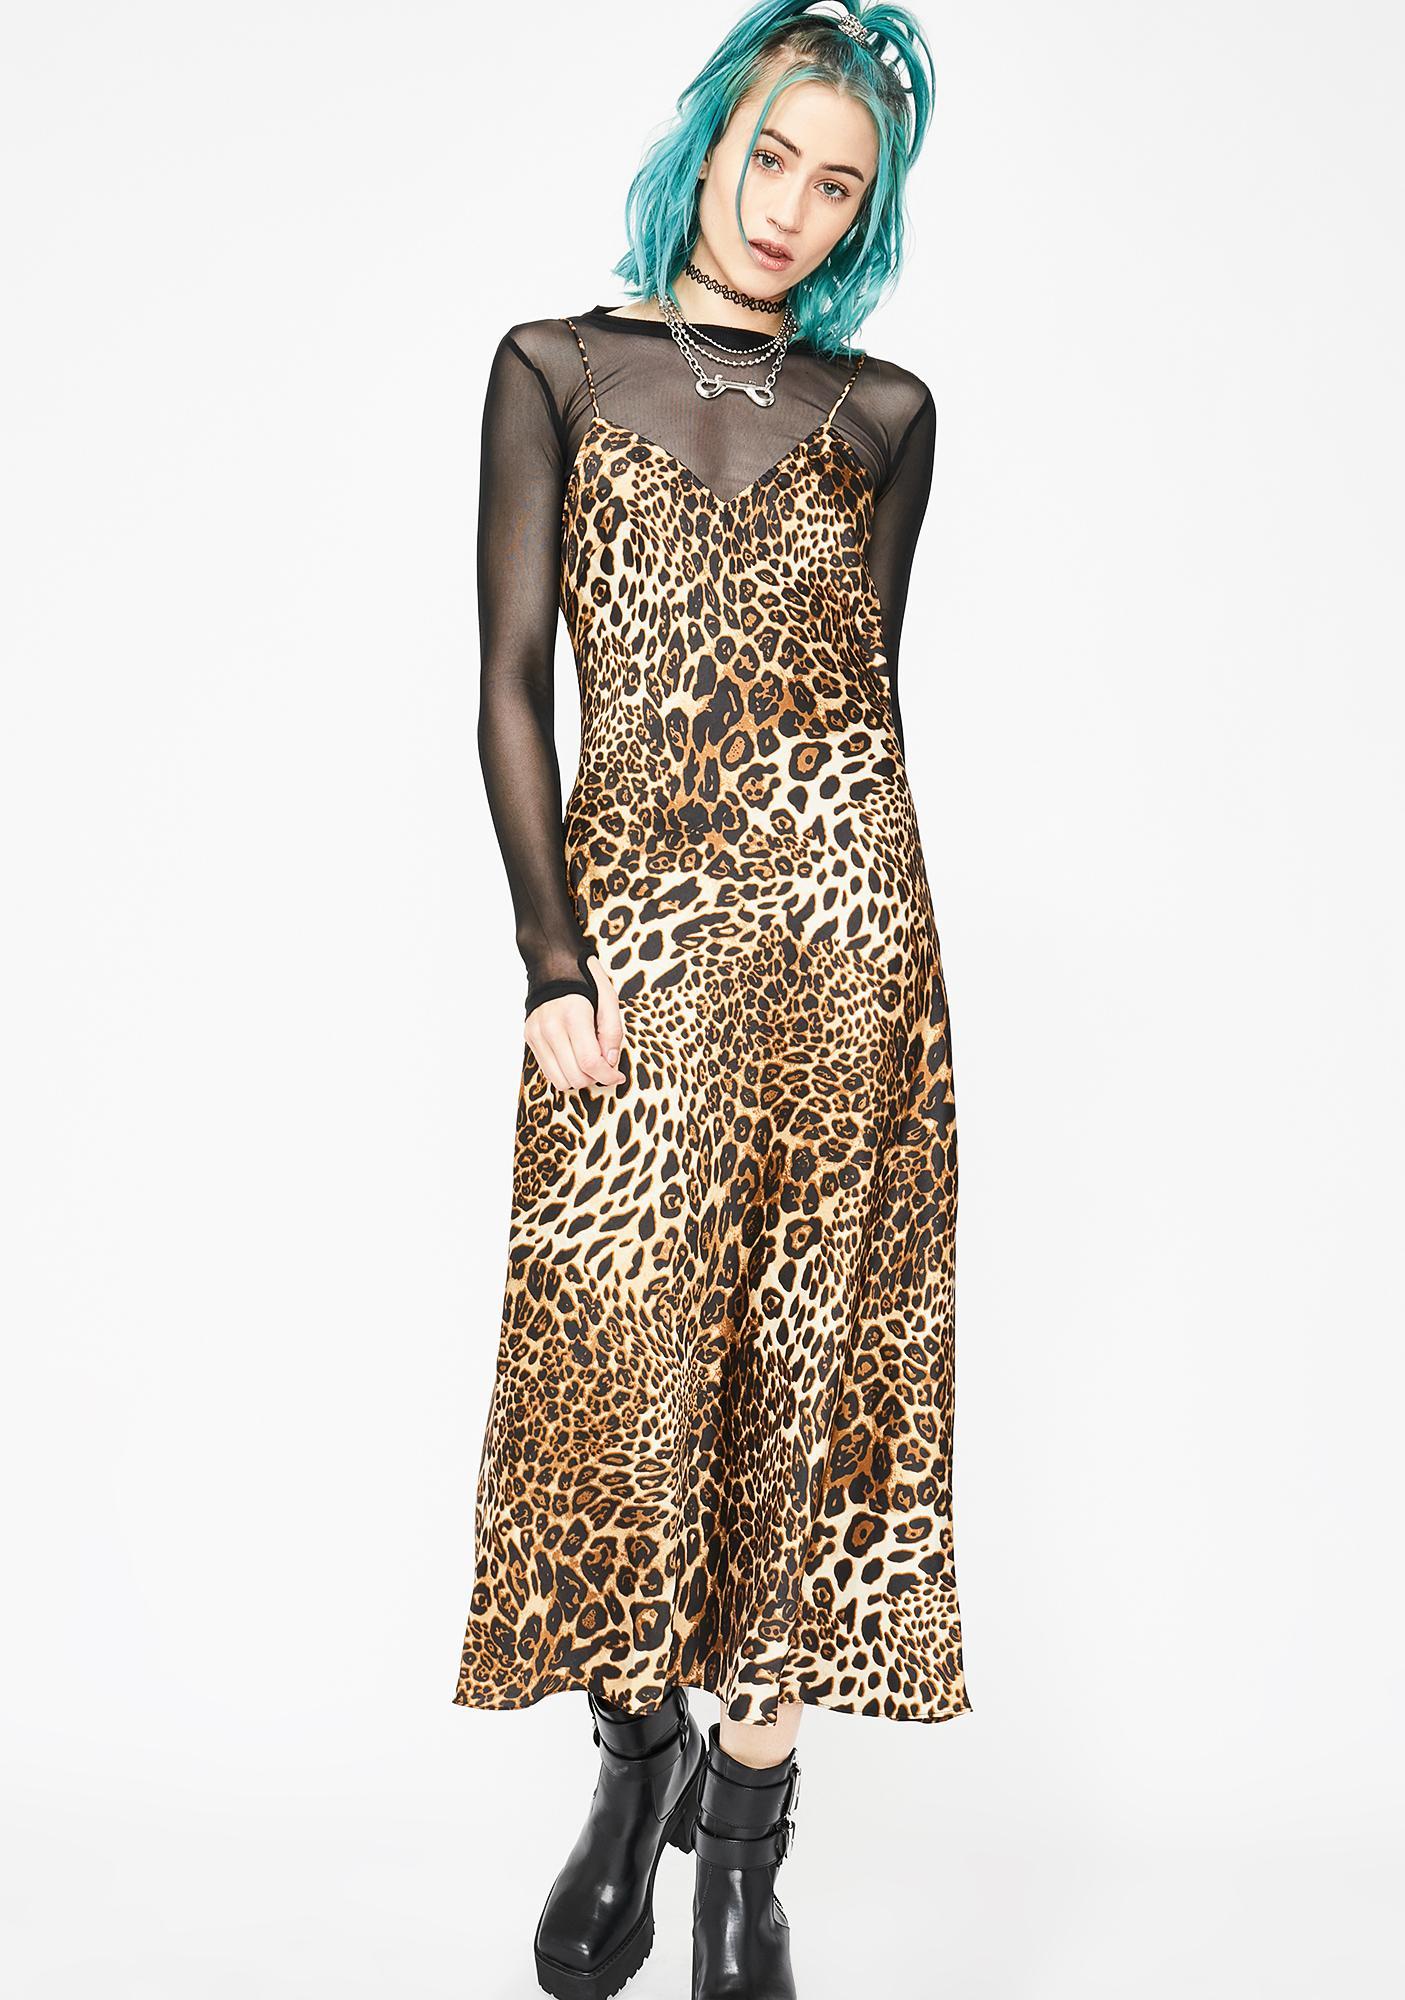 861a775cc6 ... Catatonic Territory Cheetah Dress ...